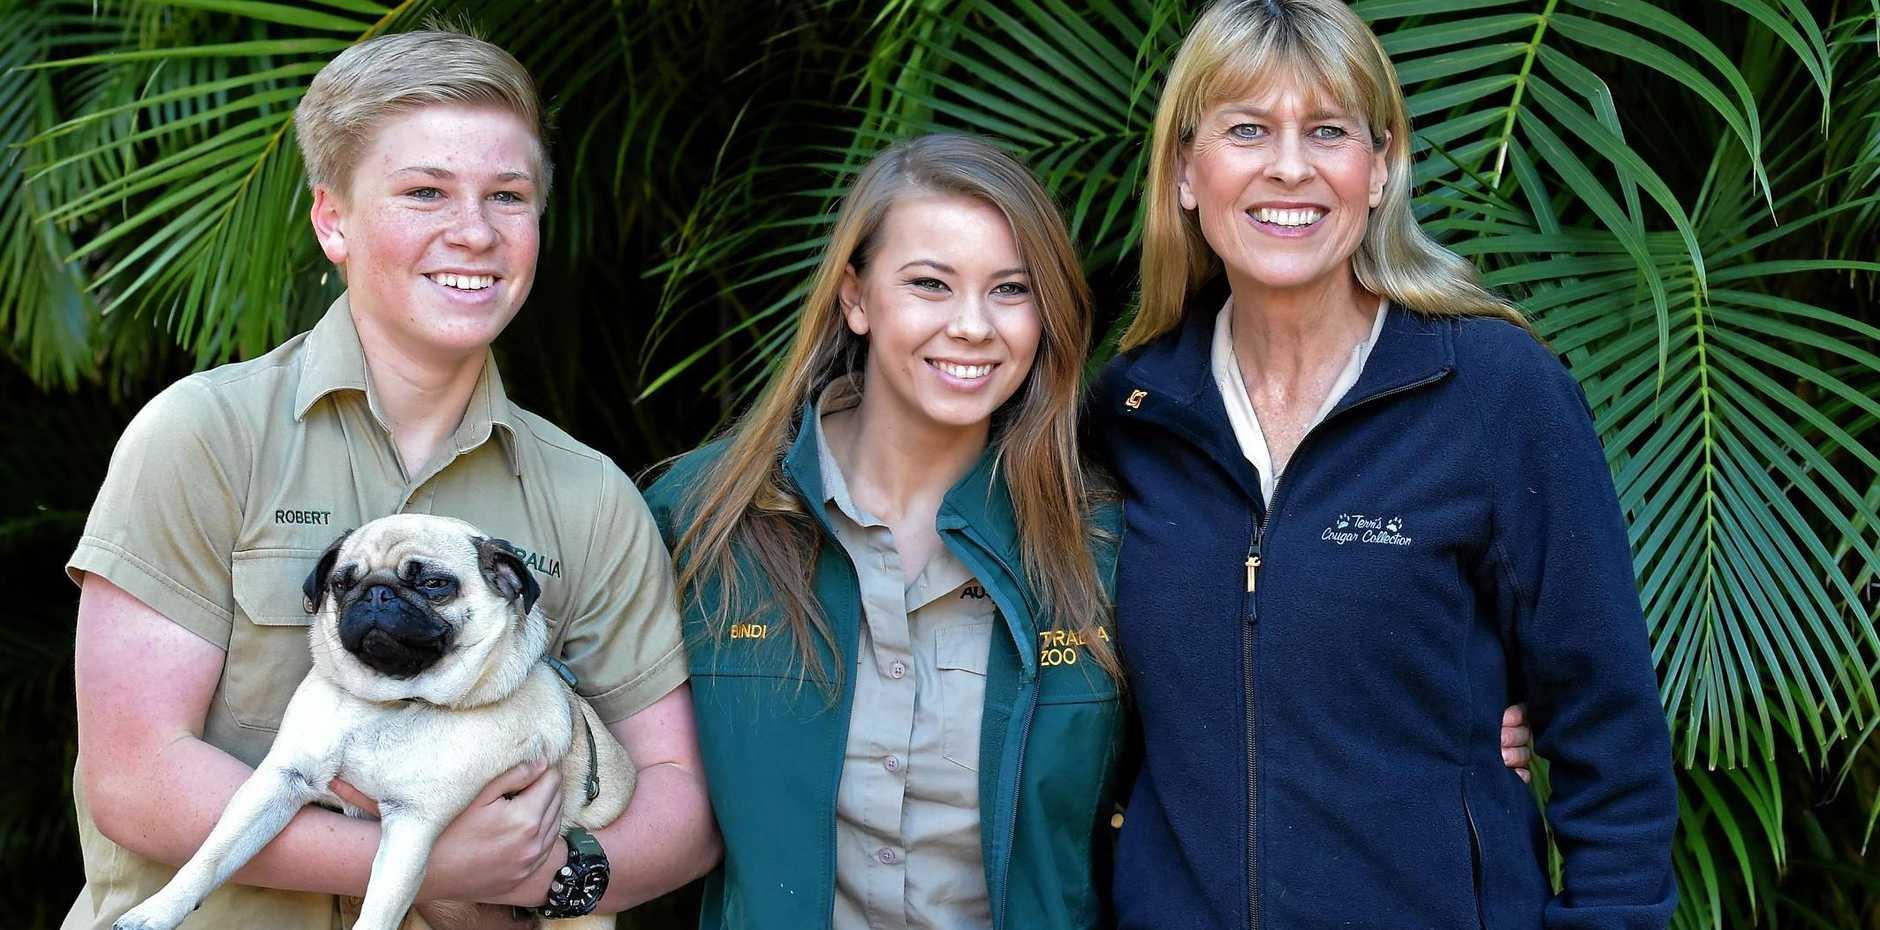 GRAB AN IRWIN BARGAIN: Robert, Bindi and Terri Irwin have contributed pre-loved goods to the Great Garage Sale at Australia Zoo.